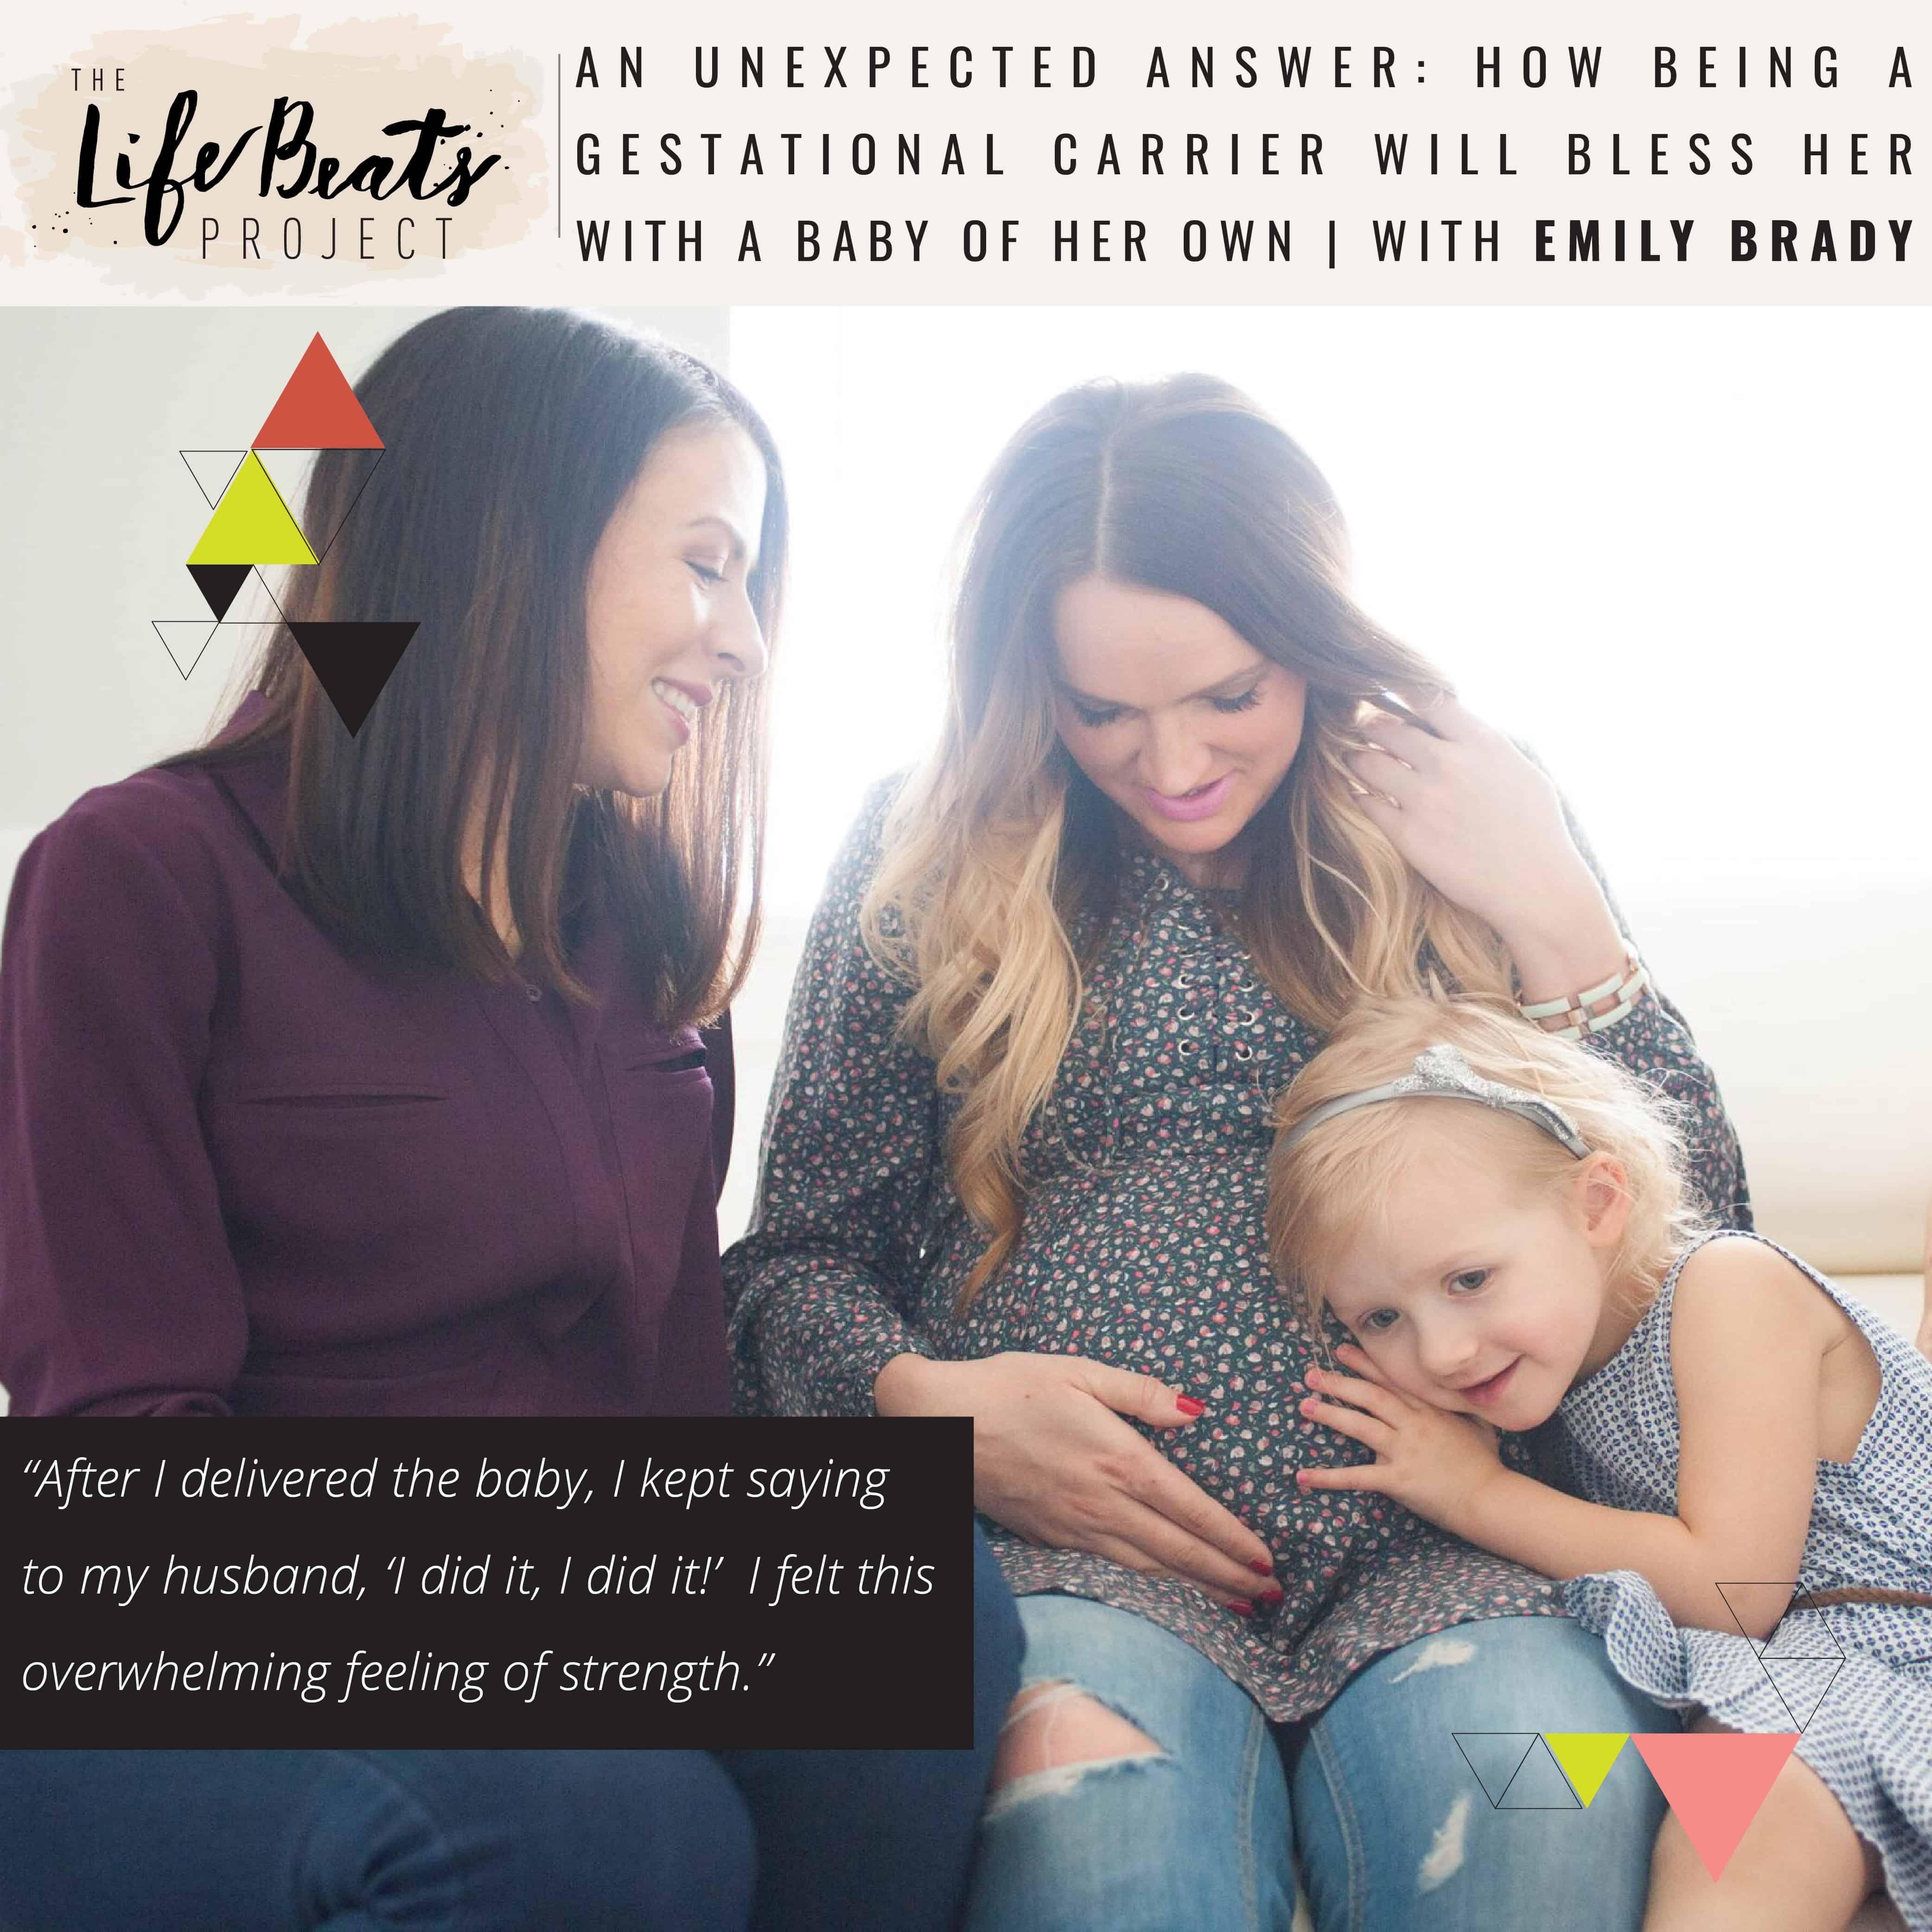 male factor infertility gestational carrier surrogate mother podcast